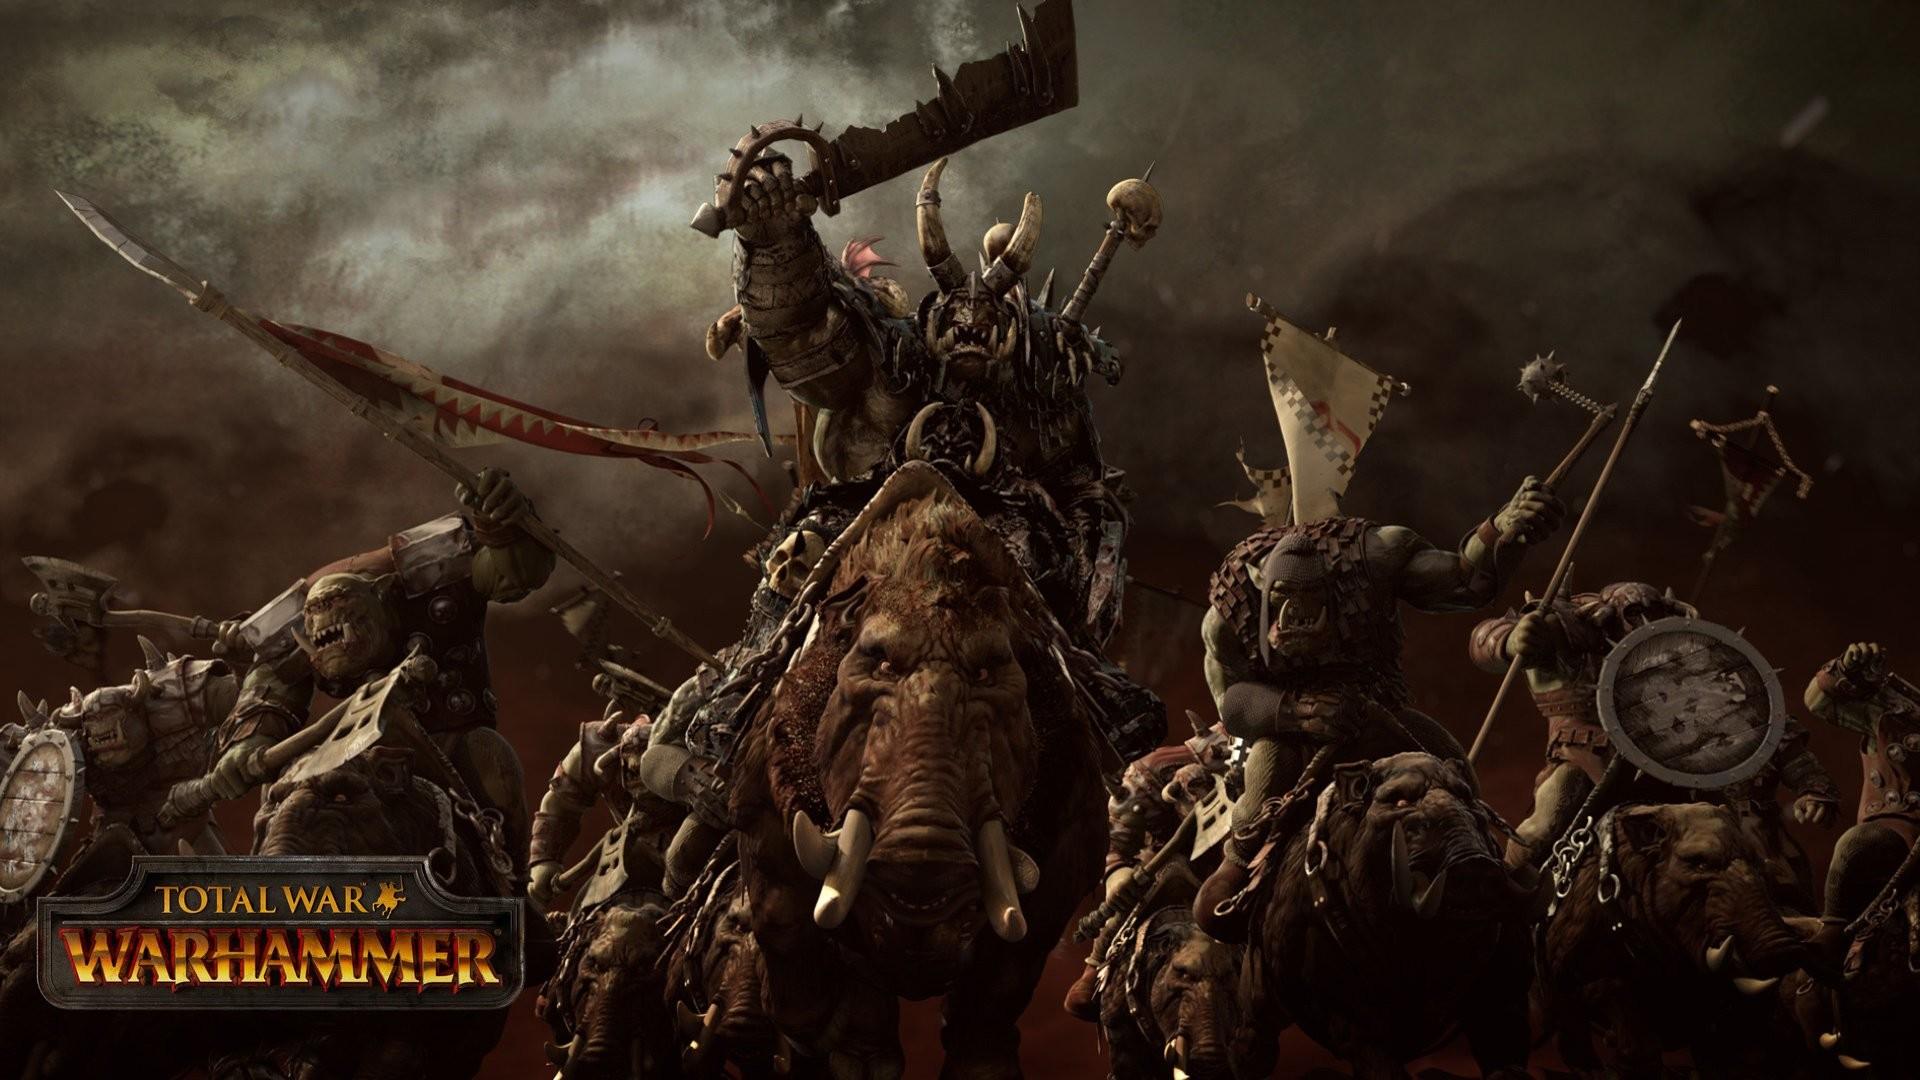 total-war-warhammer wallpapers, games wallpapers, pc-games .